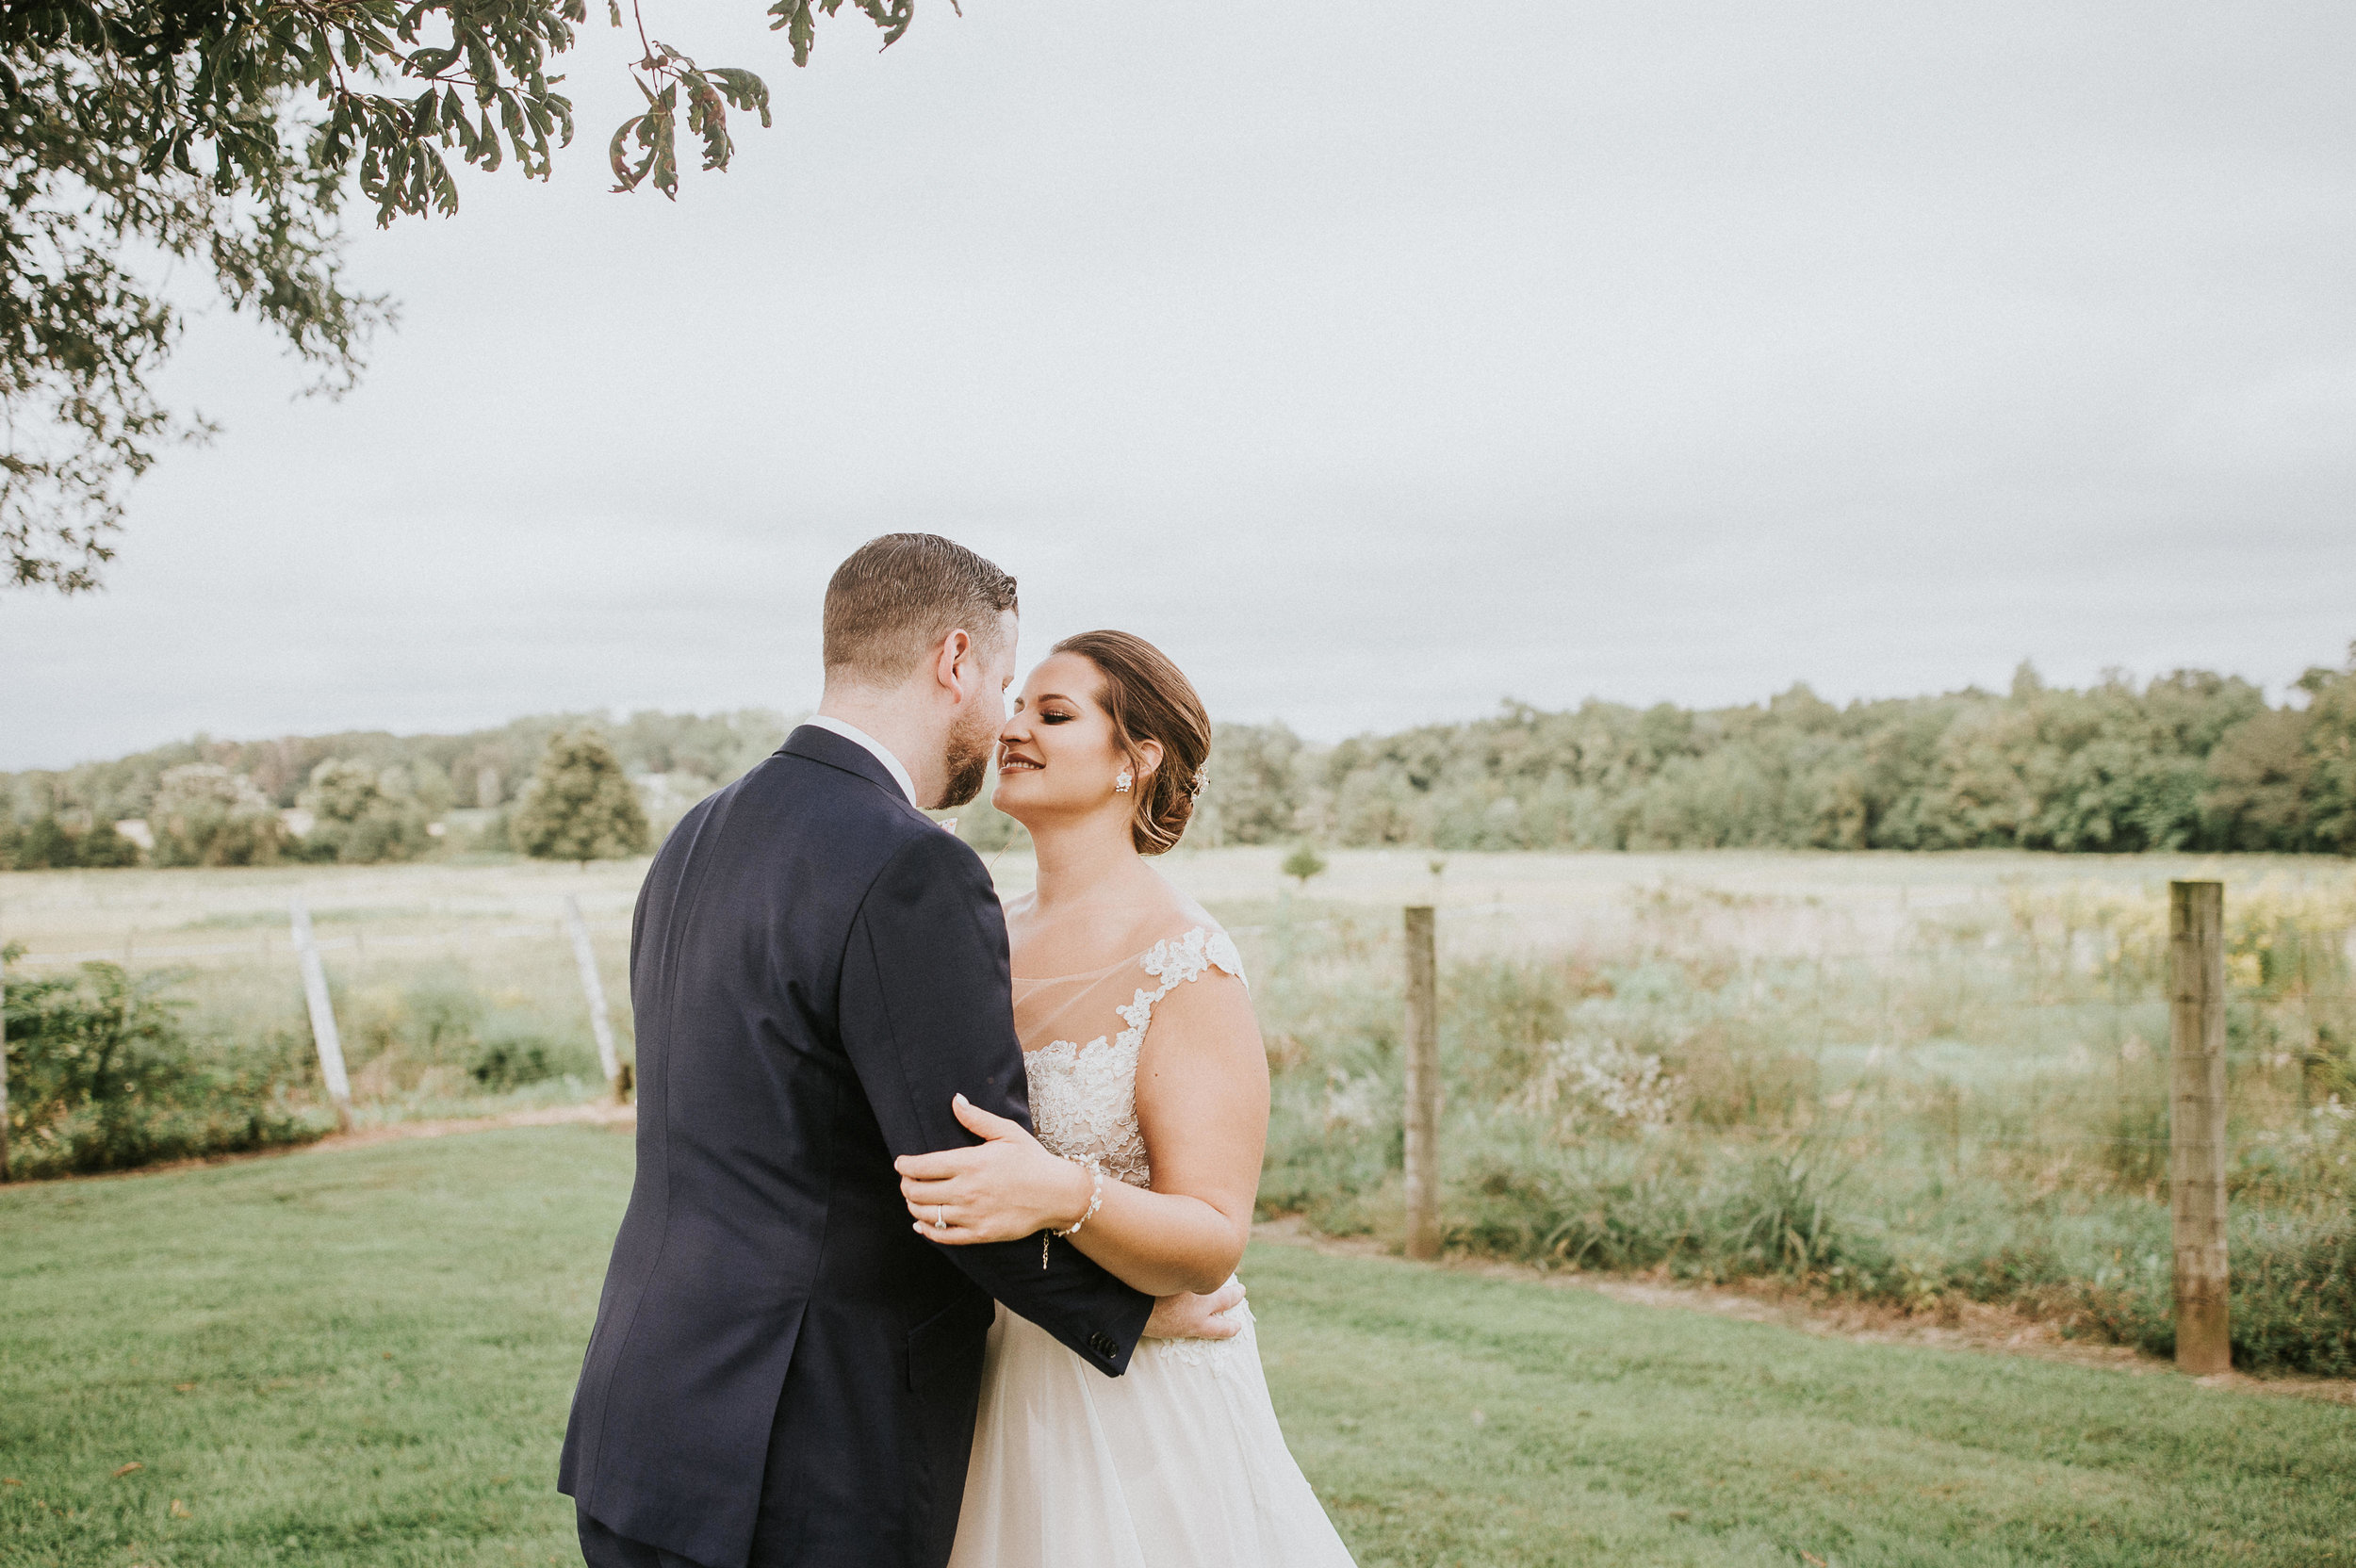 Johnson-Locust-Hall-Farm-Wedding-Christine-Kevin-496.jpg